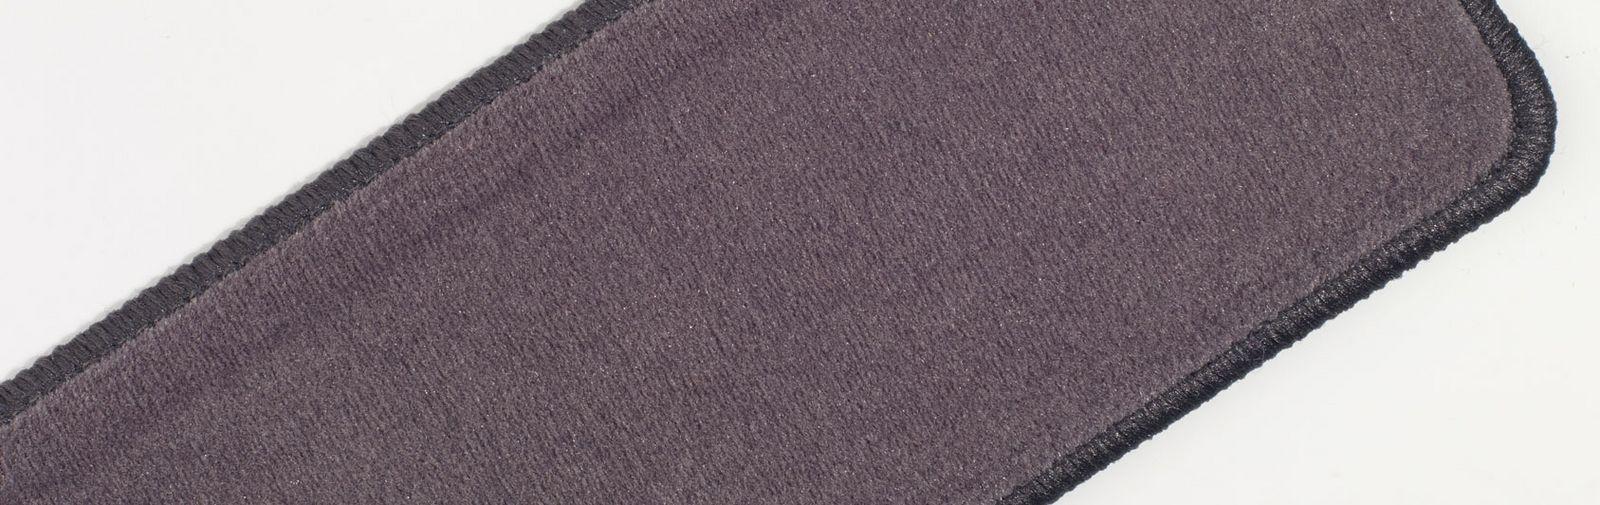 sample hassock plain velvet color code 682 color dark grey